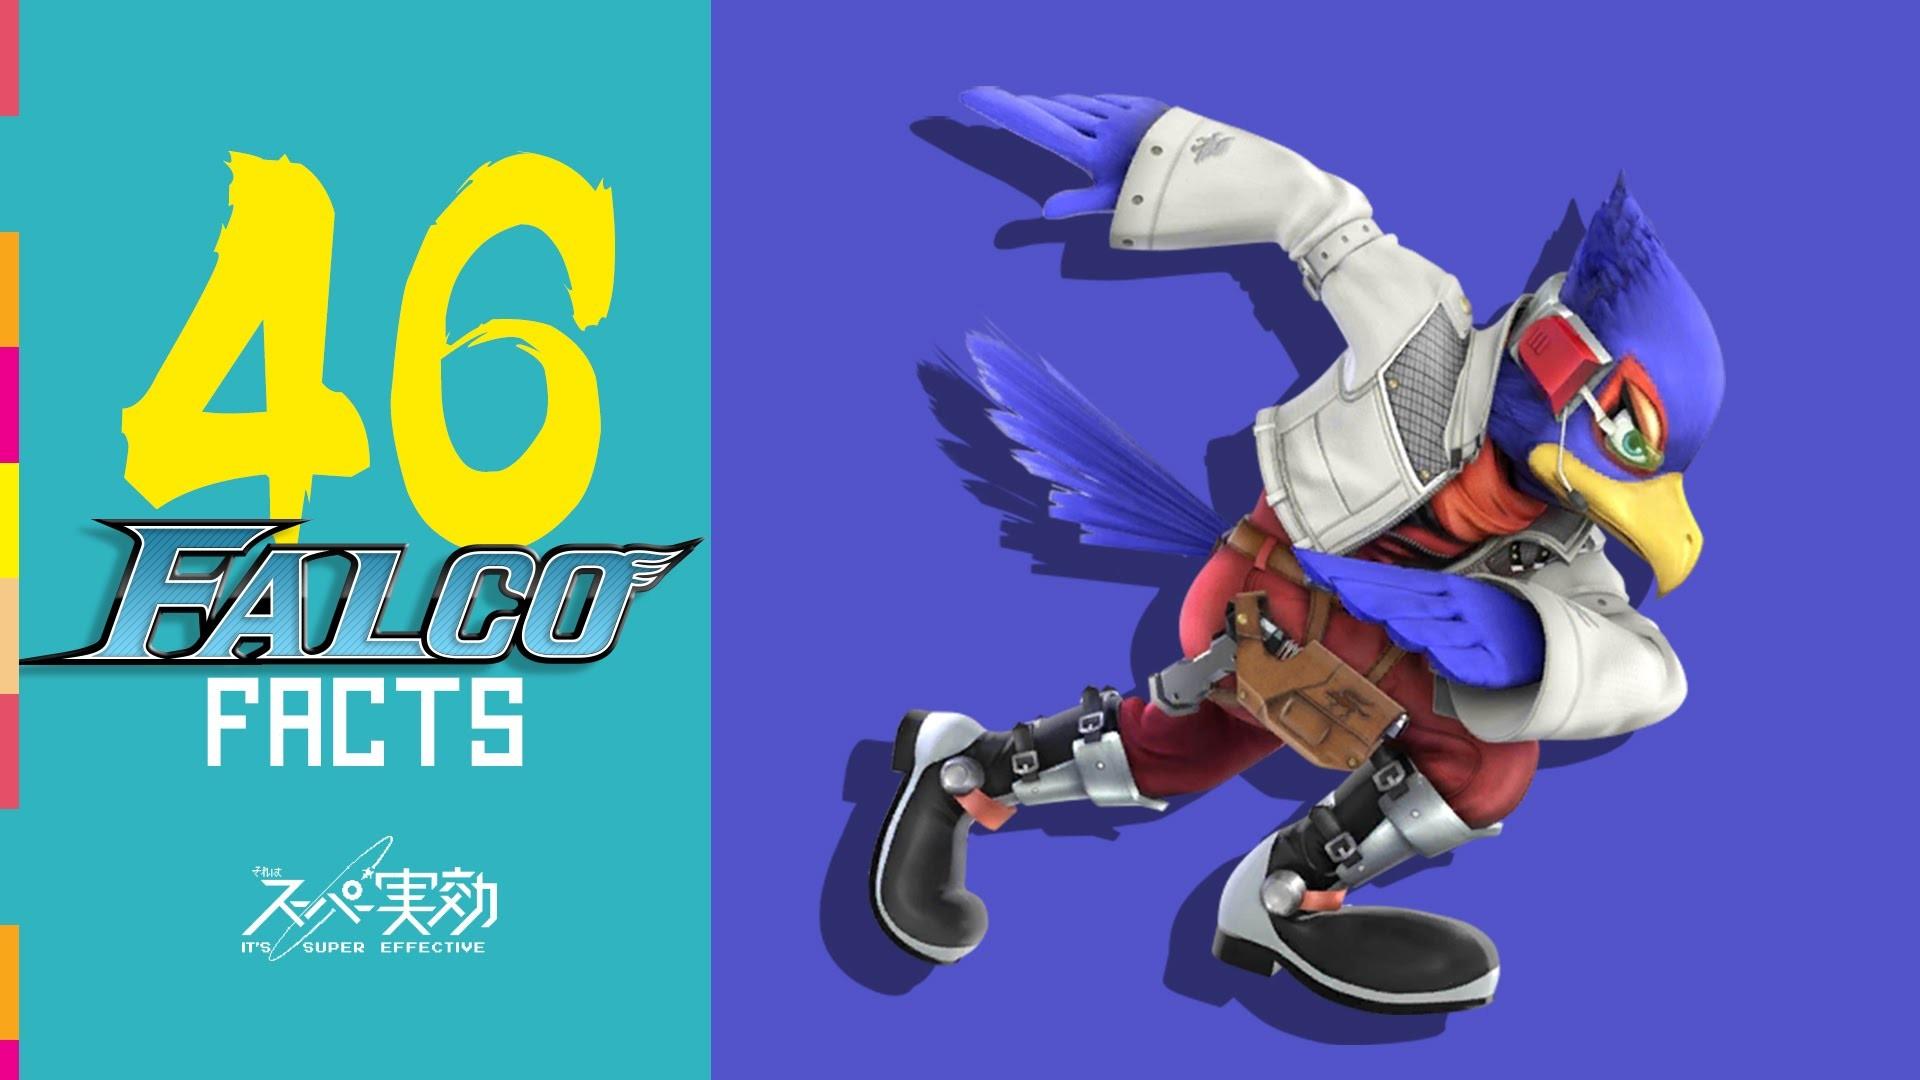 Star Fox Falco Facts! – It's Super Effective!!! 46 Historic Facts!